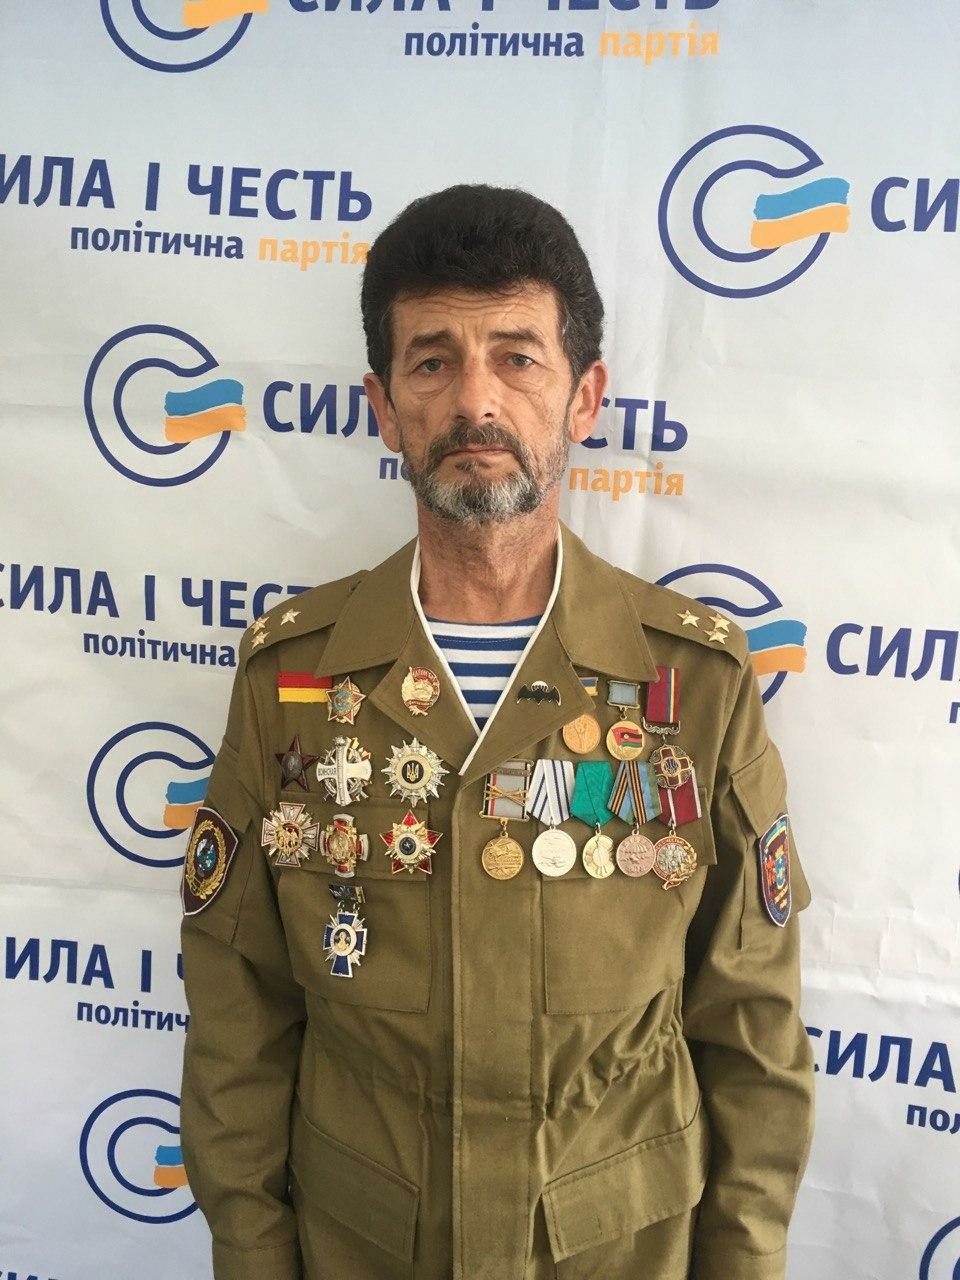 Олександр Левчук